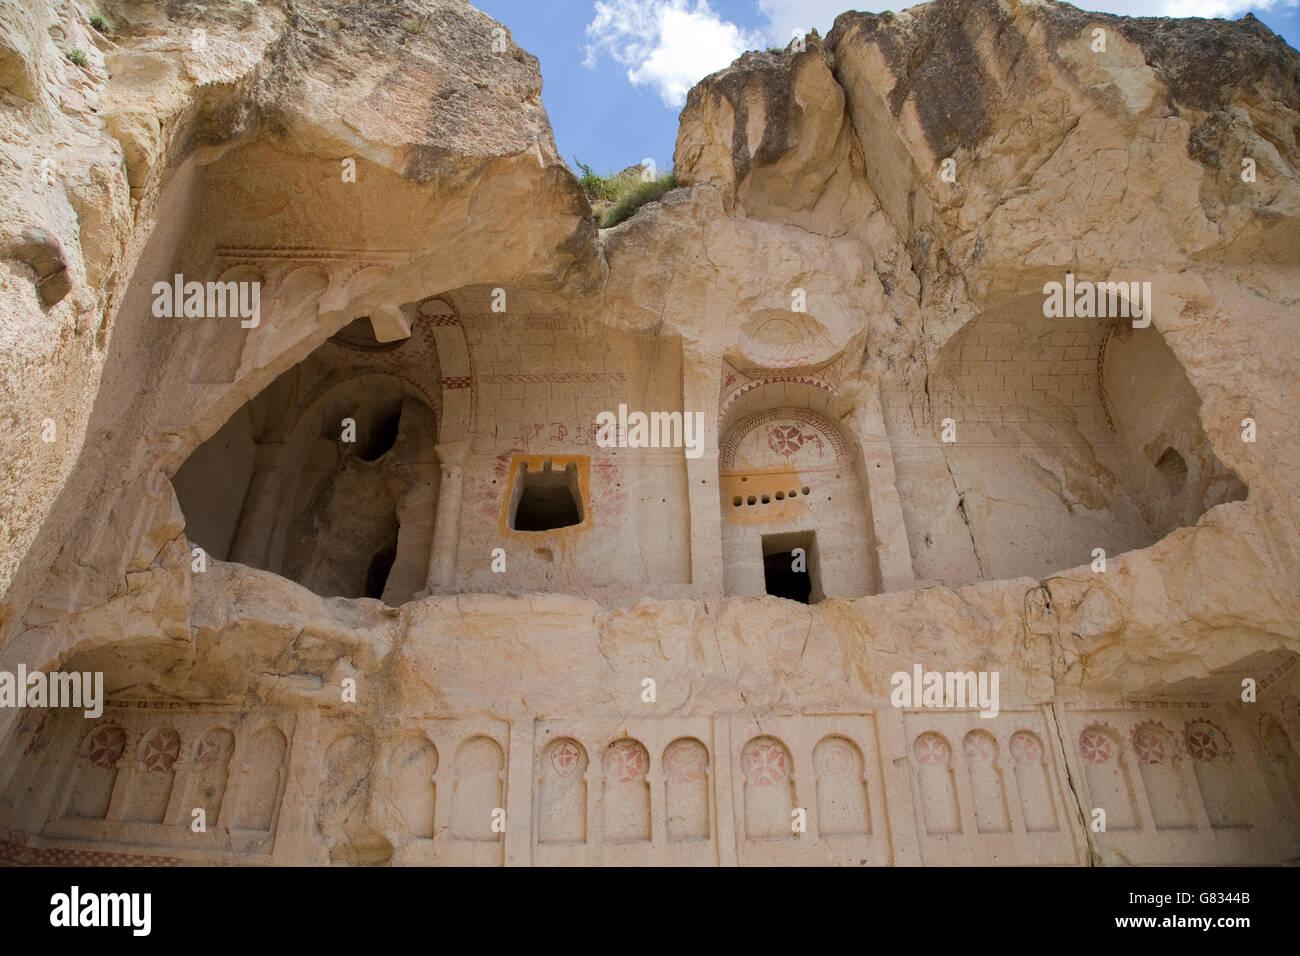 Turkey,Central Anatolia,Nevsehir Province,Cappadocia,Goereme - Stock Image